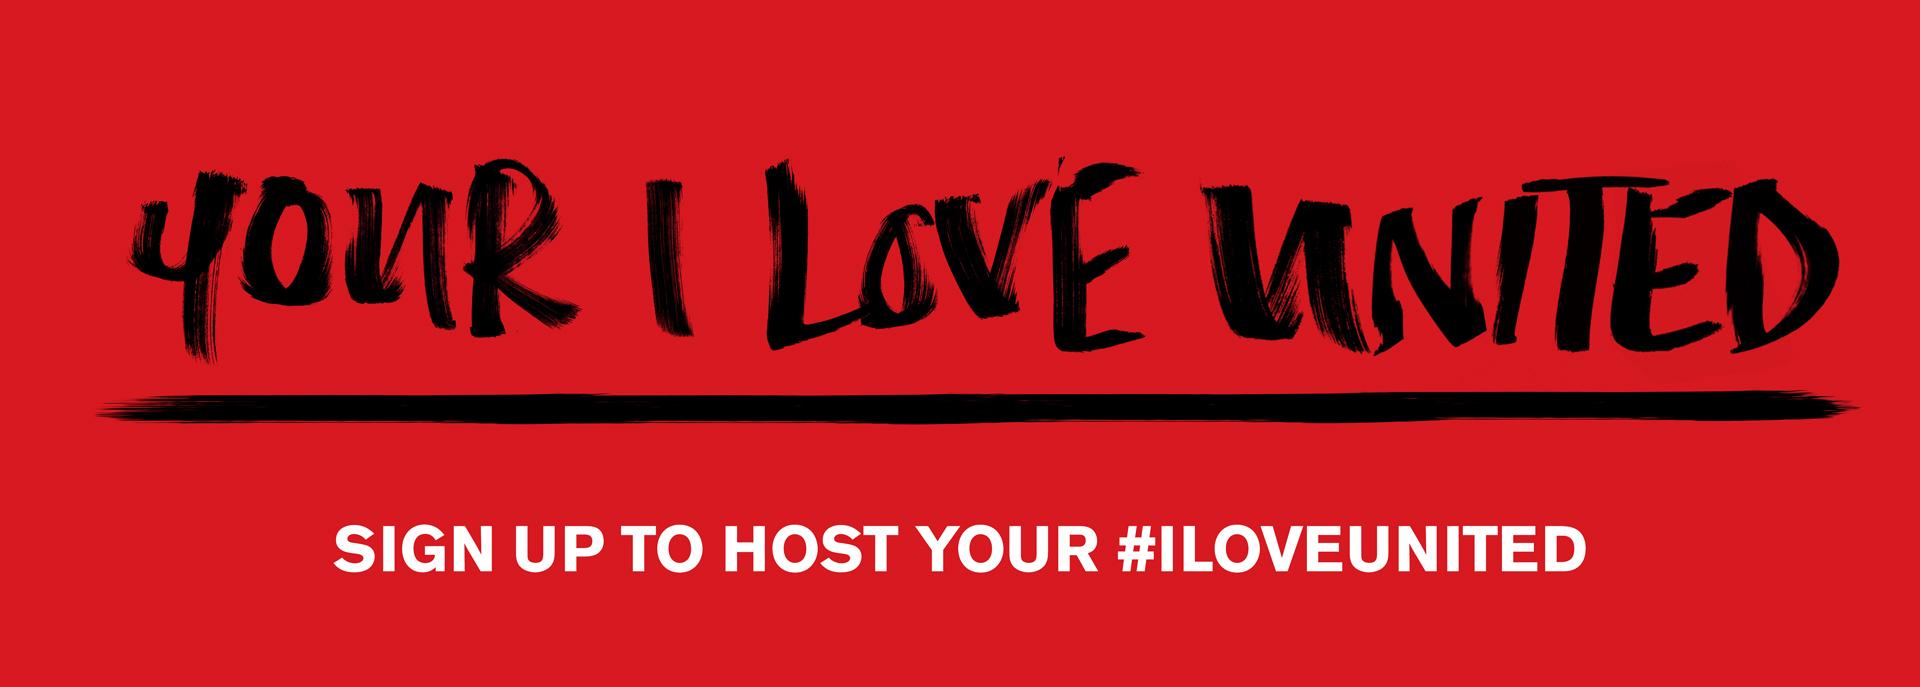 ilove成�yl>{��[�_using #iloveunited to enter